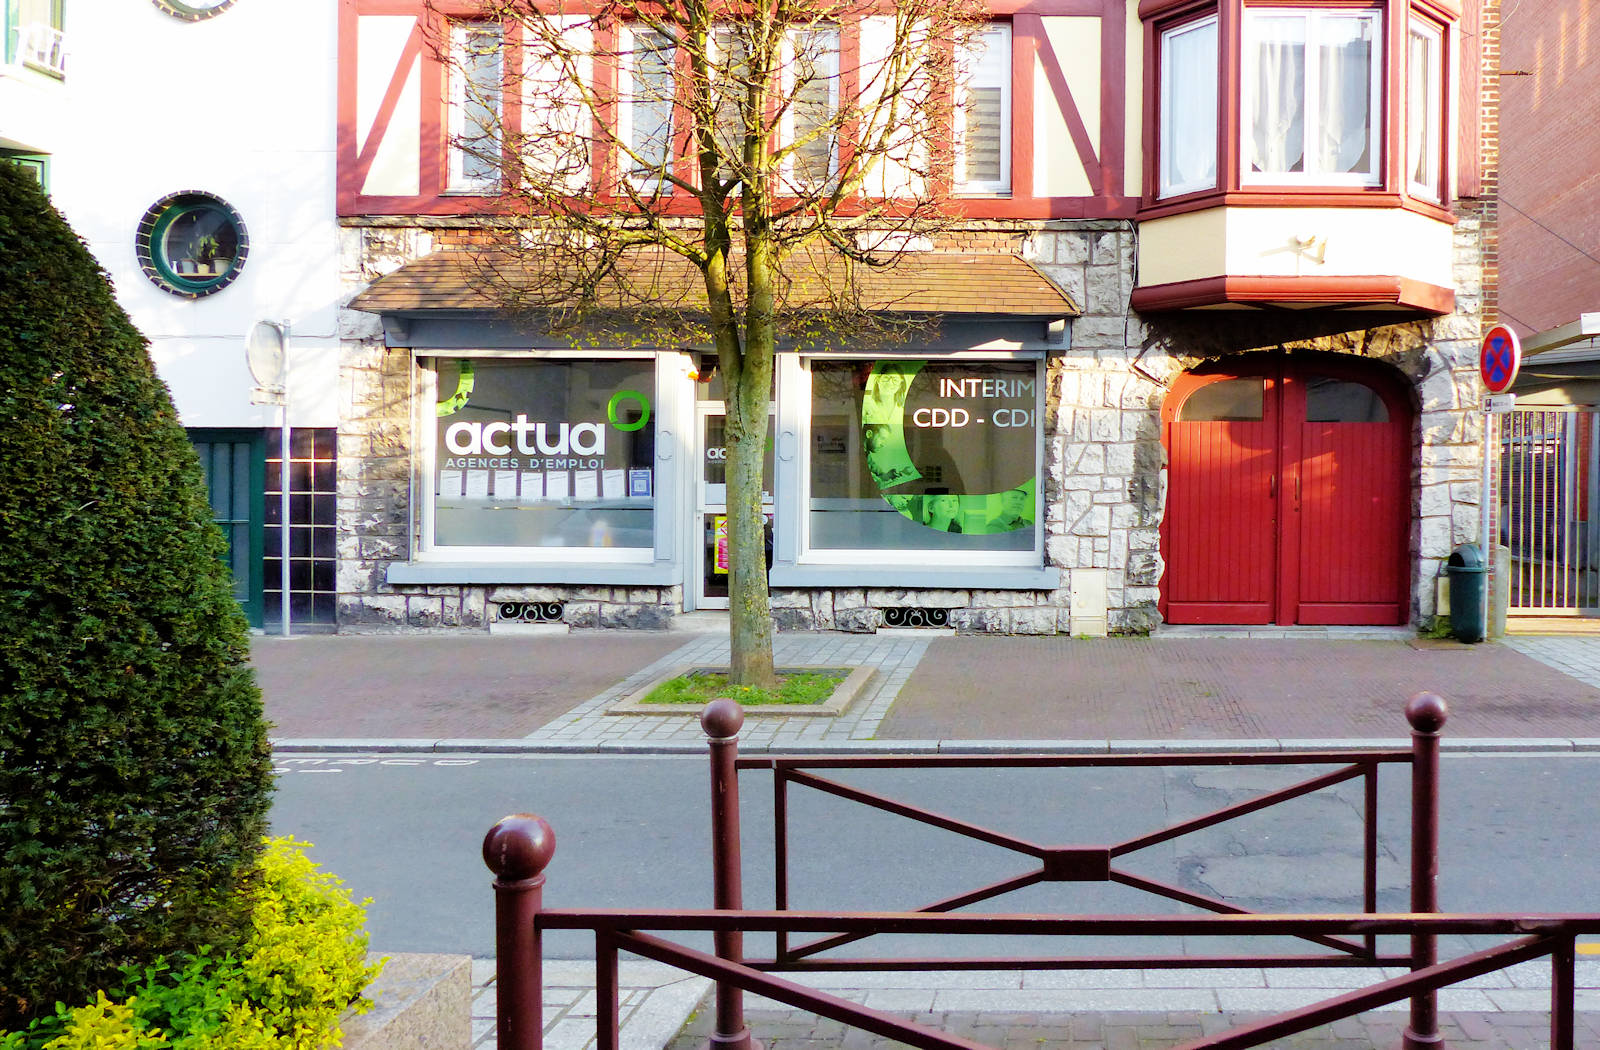 Agence d'emploi Actua - Rue de la Cloche, Tourcoing